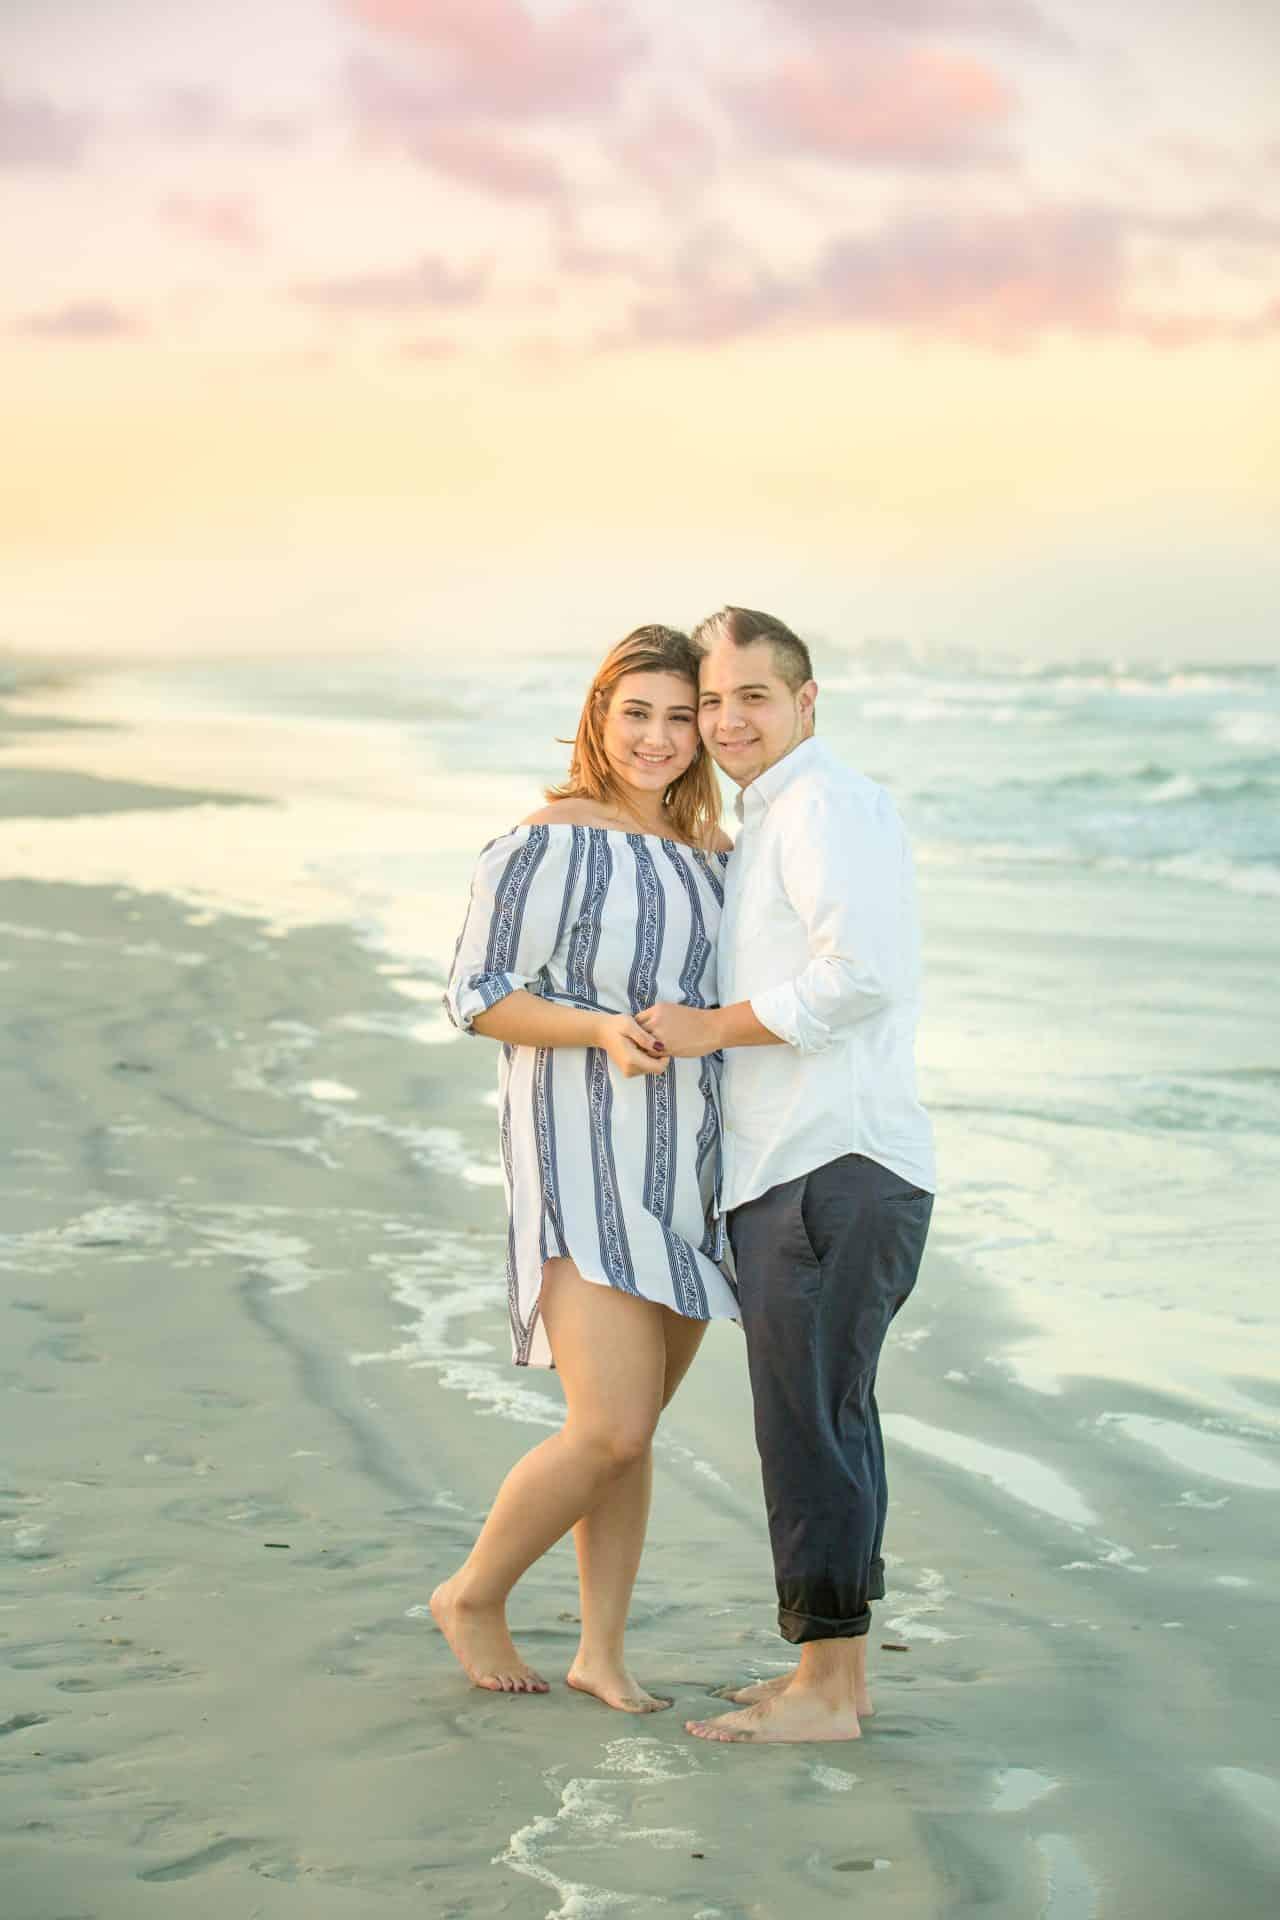 space coast photographer, family photography melbourne fl, wedding photographer neptune beach, couple photography beach photos